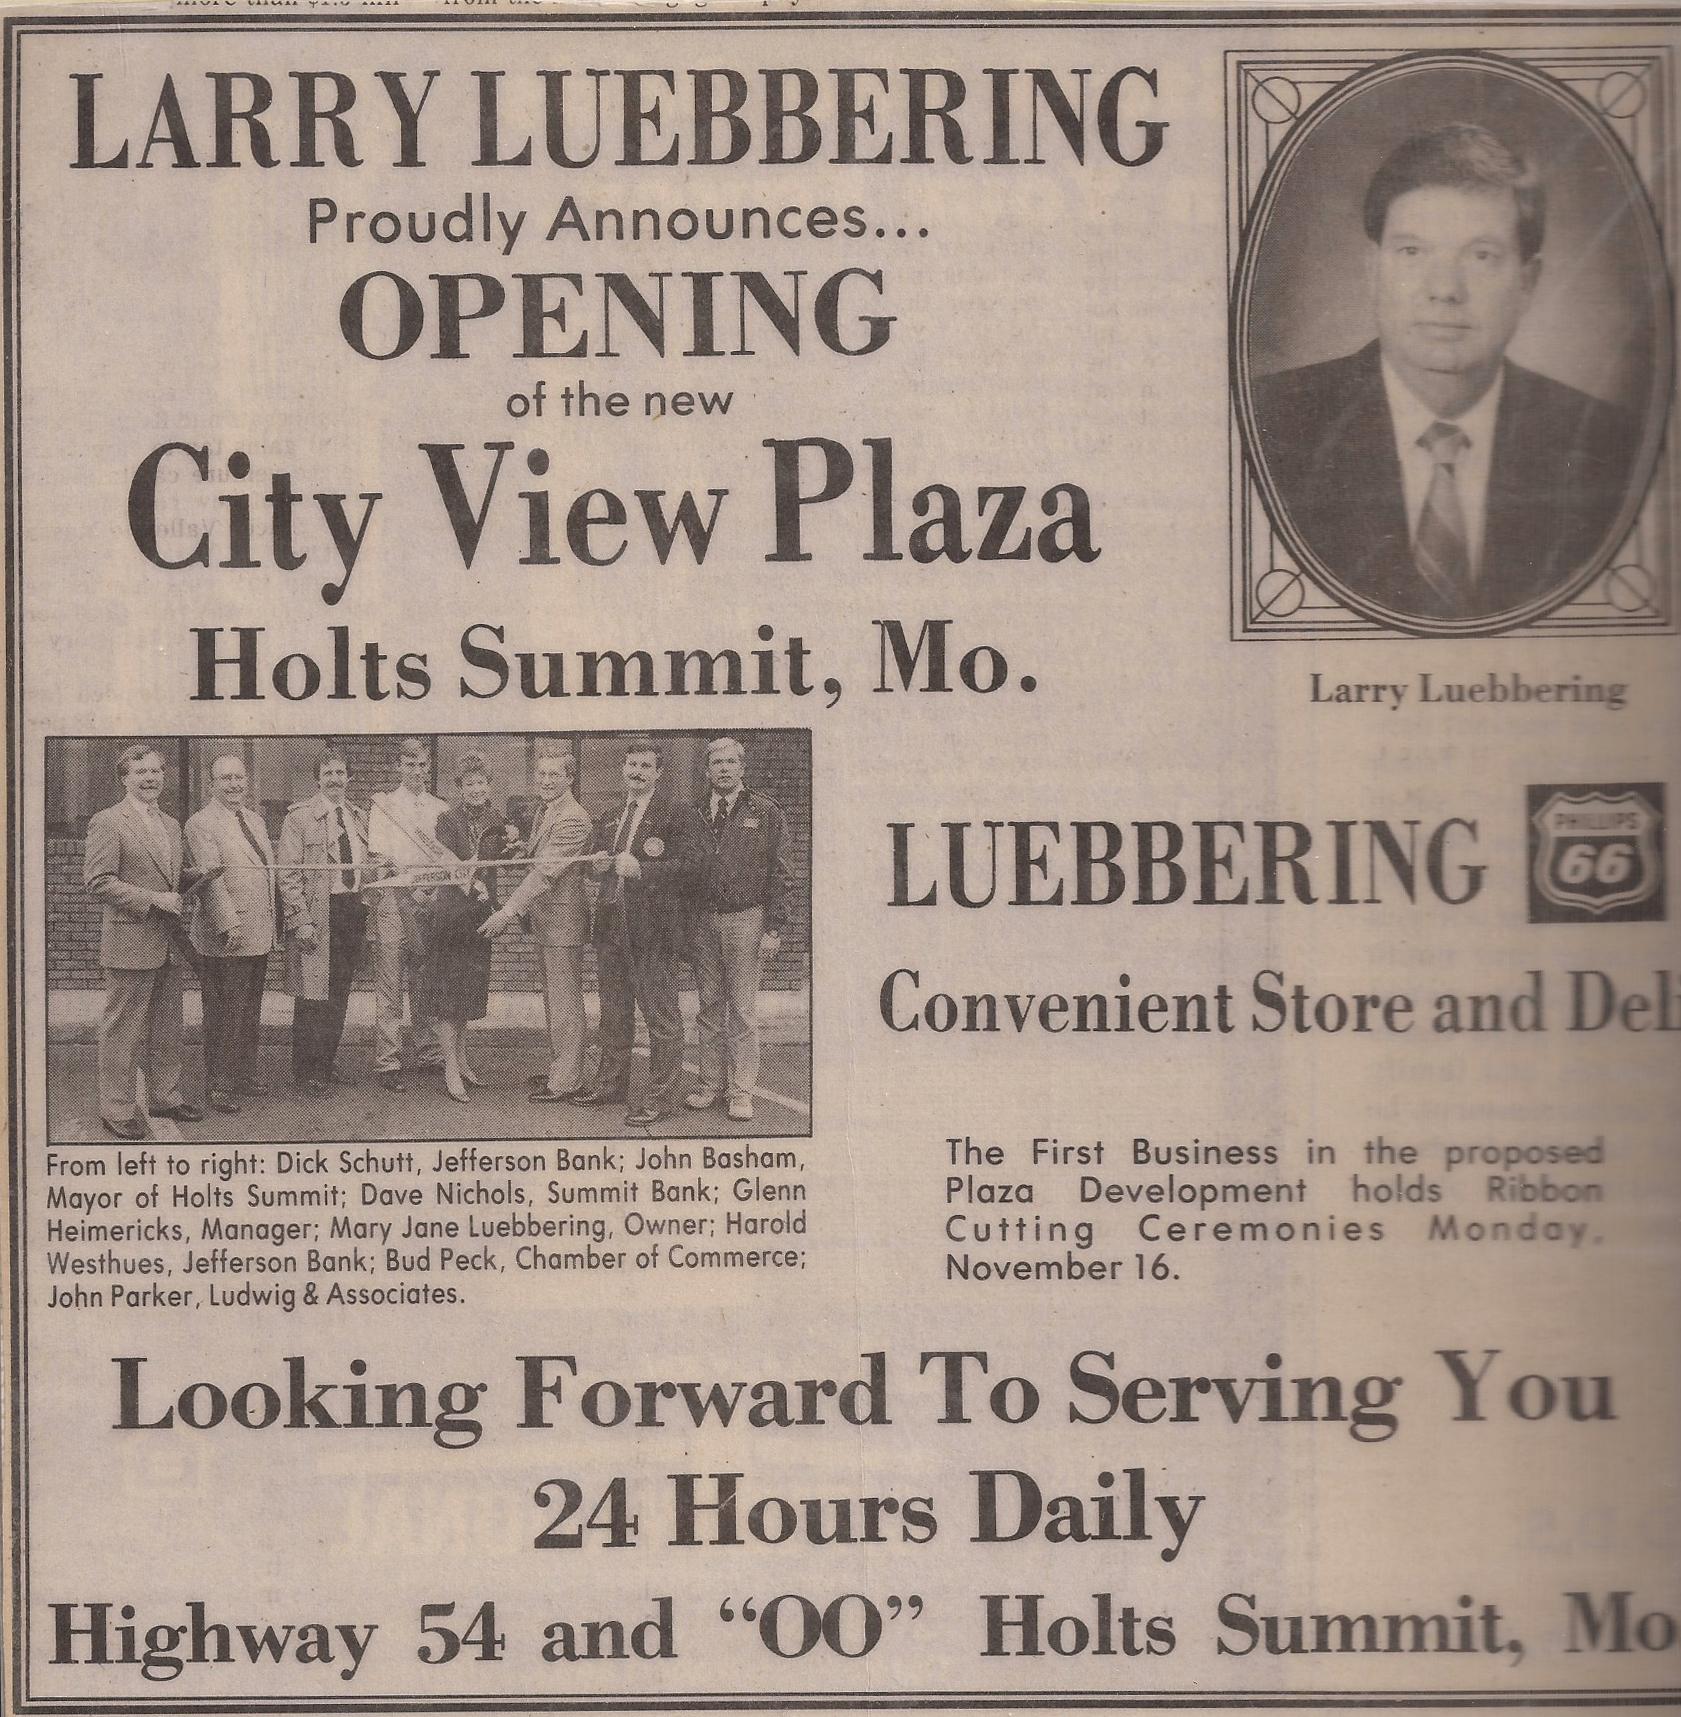 Luebbering's 66